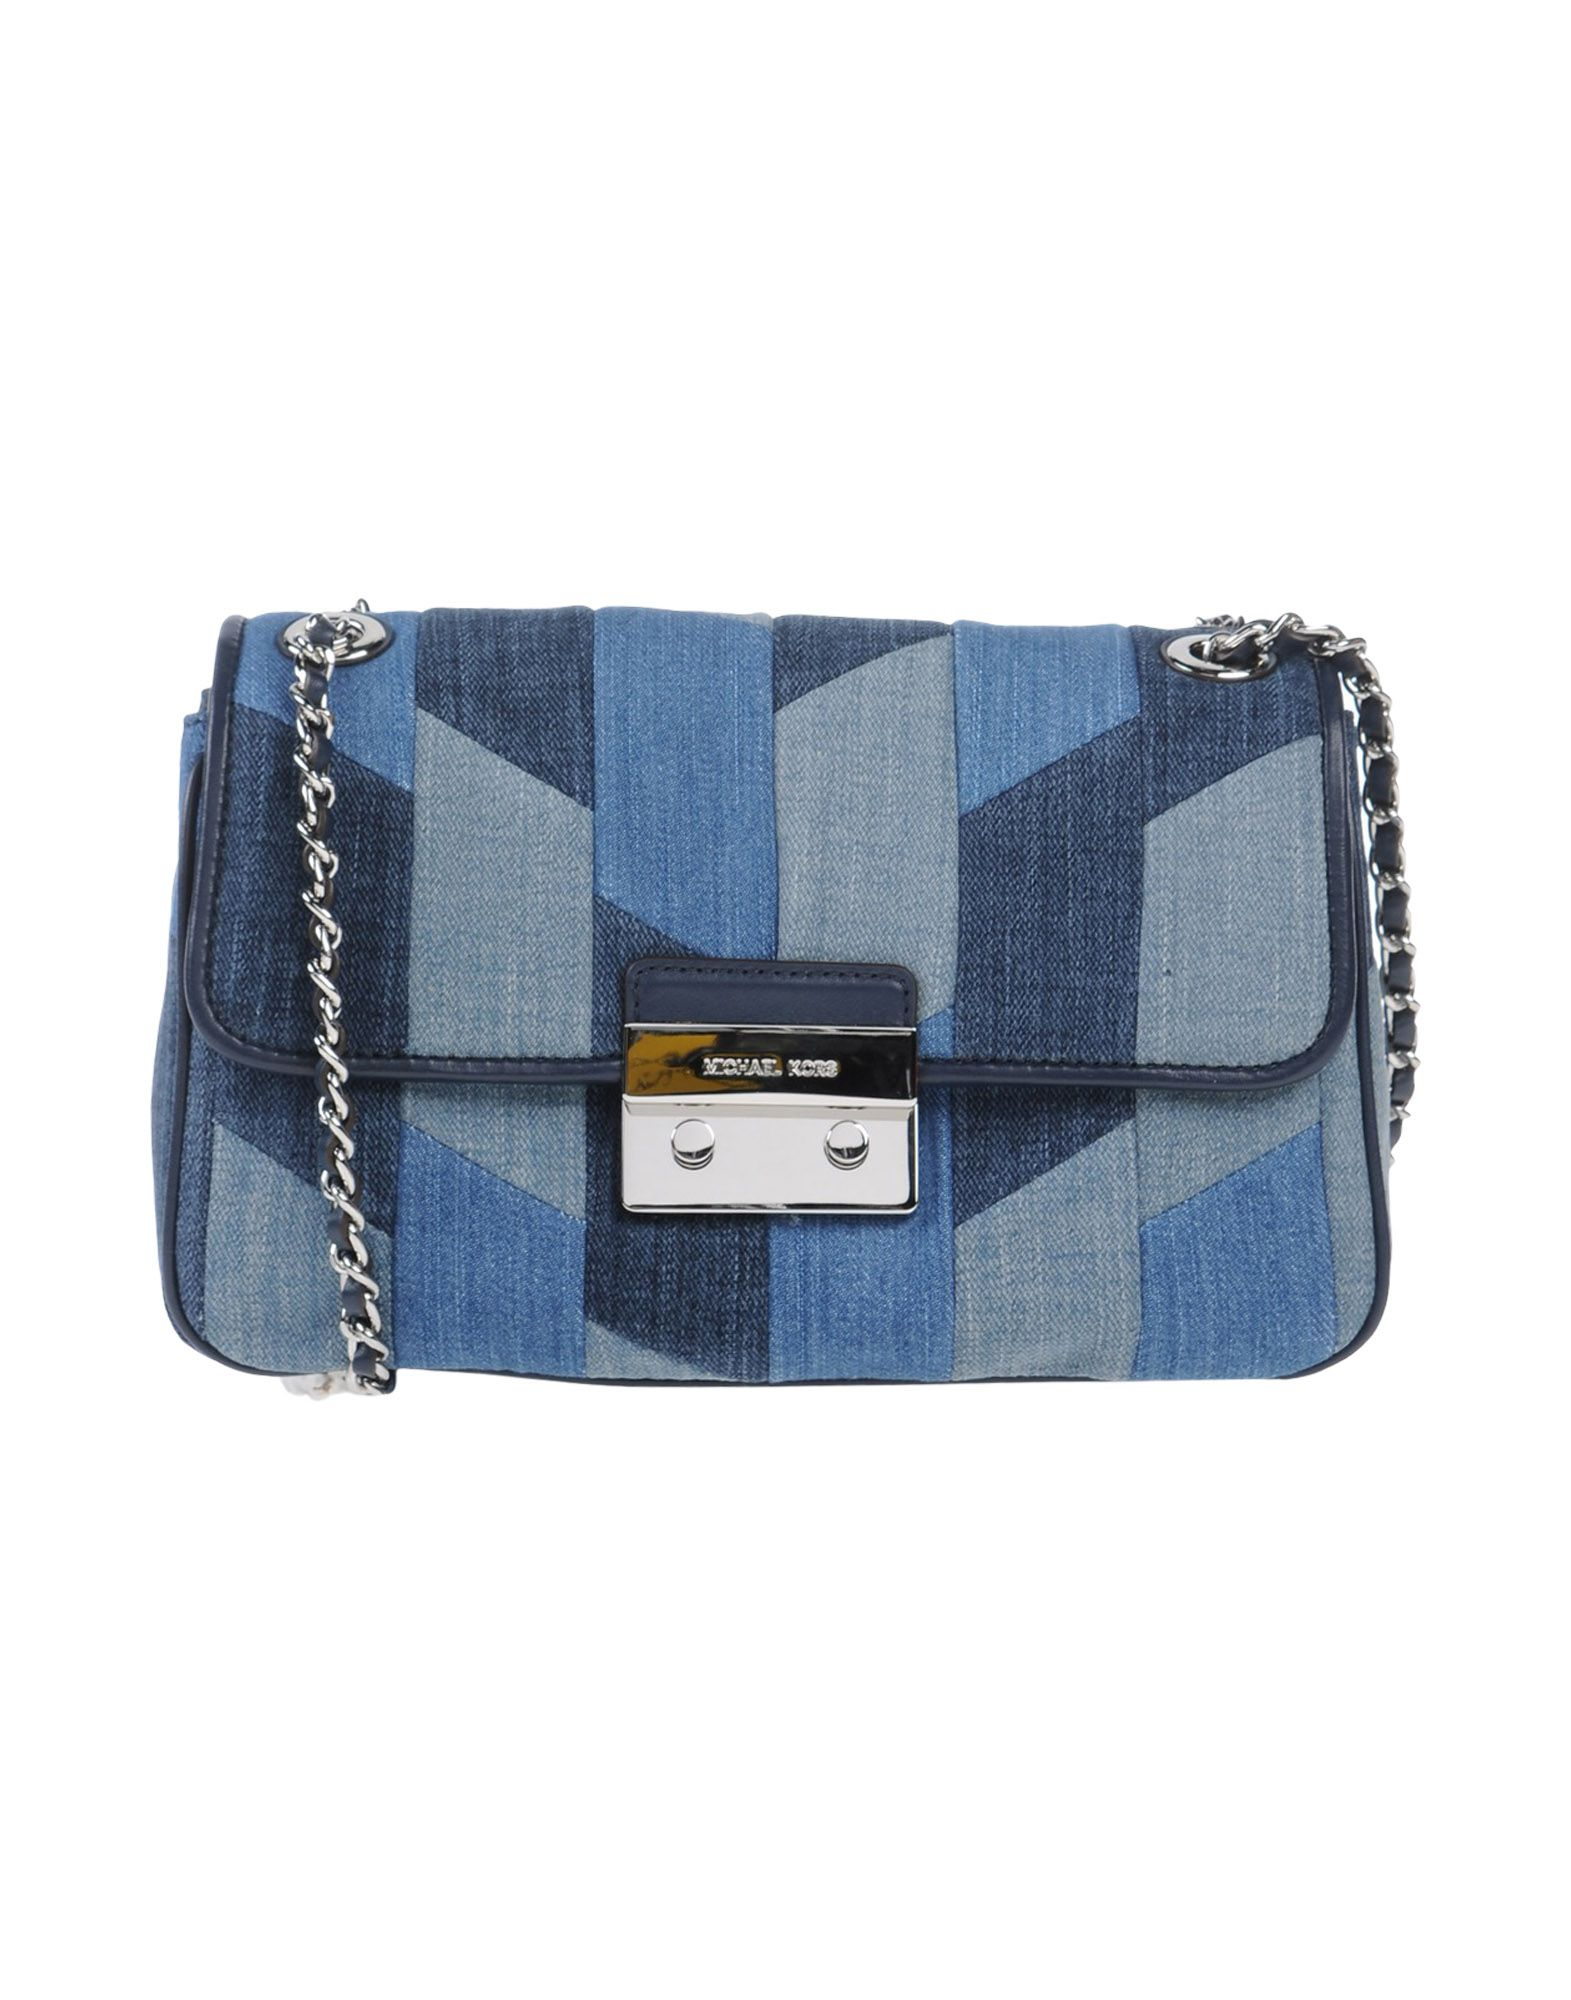 Michael Kors Jet Set Travel Small Cross Body Bag Leather Phone Case Jetset Plum Handbags